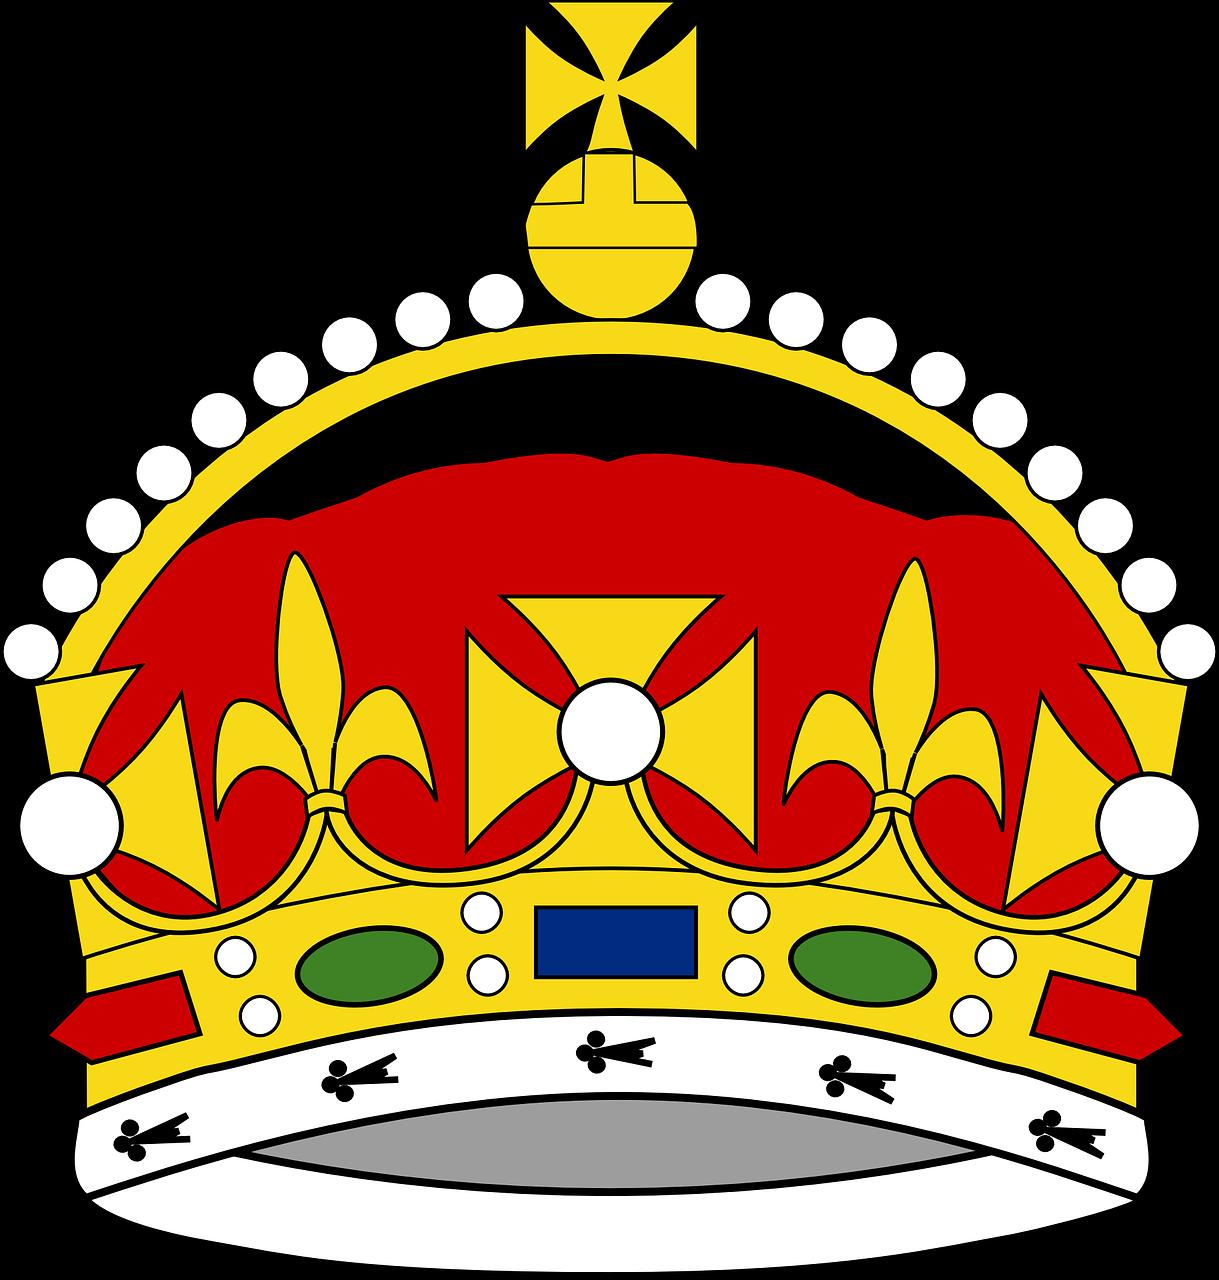 Crown George Prince Free Vector Graphic On Pixabay Kami juga punya banyak game lain yang mirip crown jewels! https creativecommons org licenses publicdomain